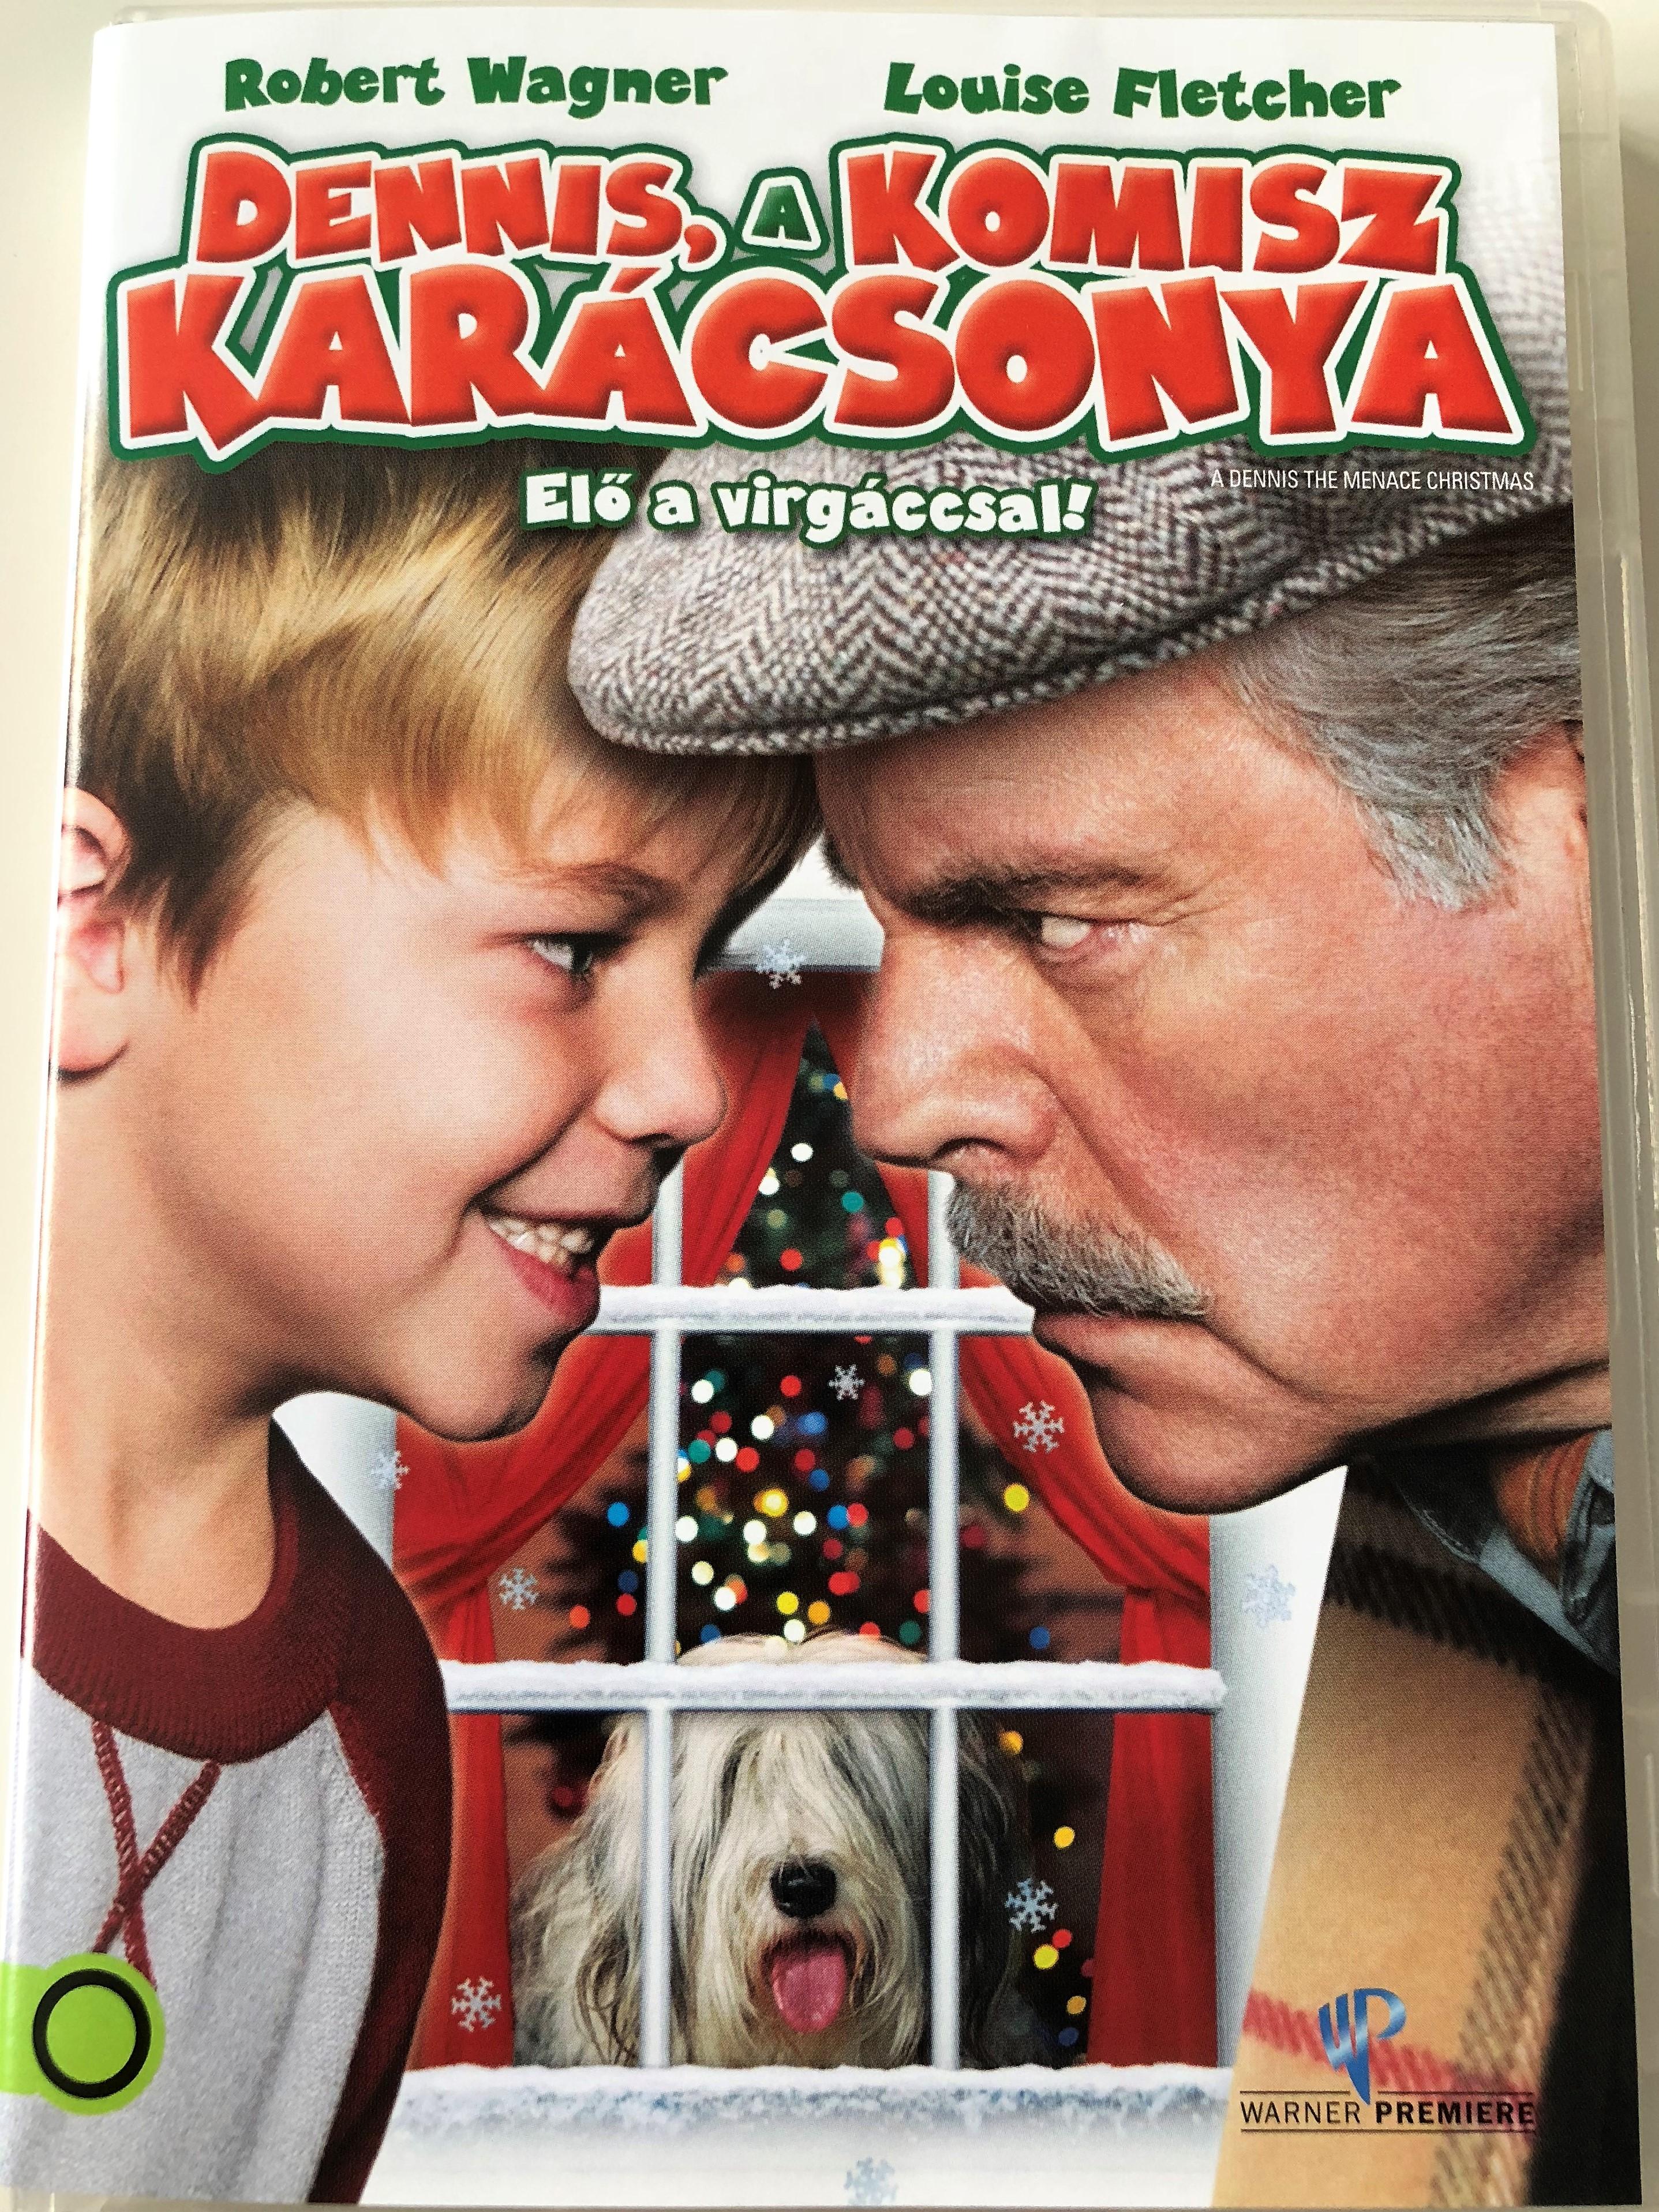 a-dennis-the-menace-christmas-dvd-2007-dennis-a-komisz-kar-csonya-directed-by-ron-oliver-starring-robert-wagner-louise-fletcher-maxwell-perry-cotton-kim-schraner-jack-noseworthy-1-.jpg